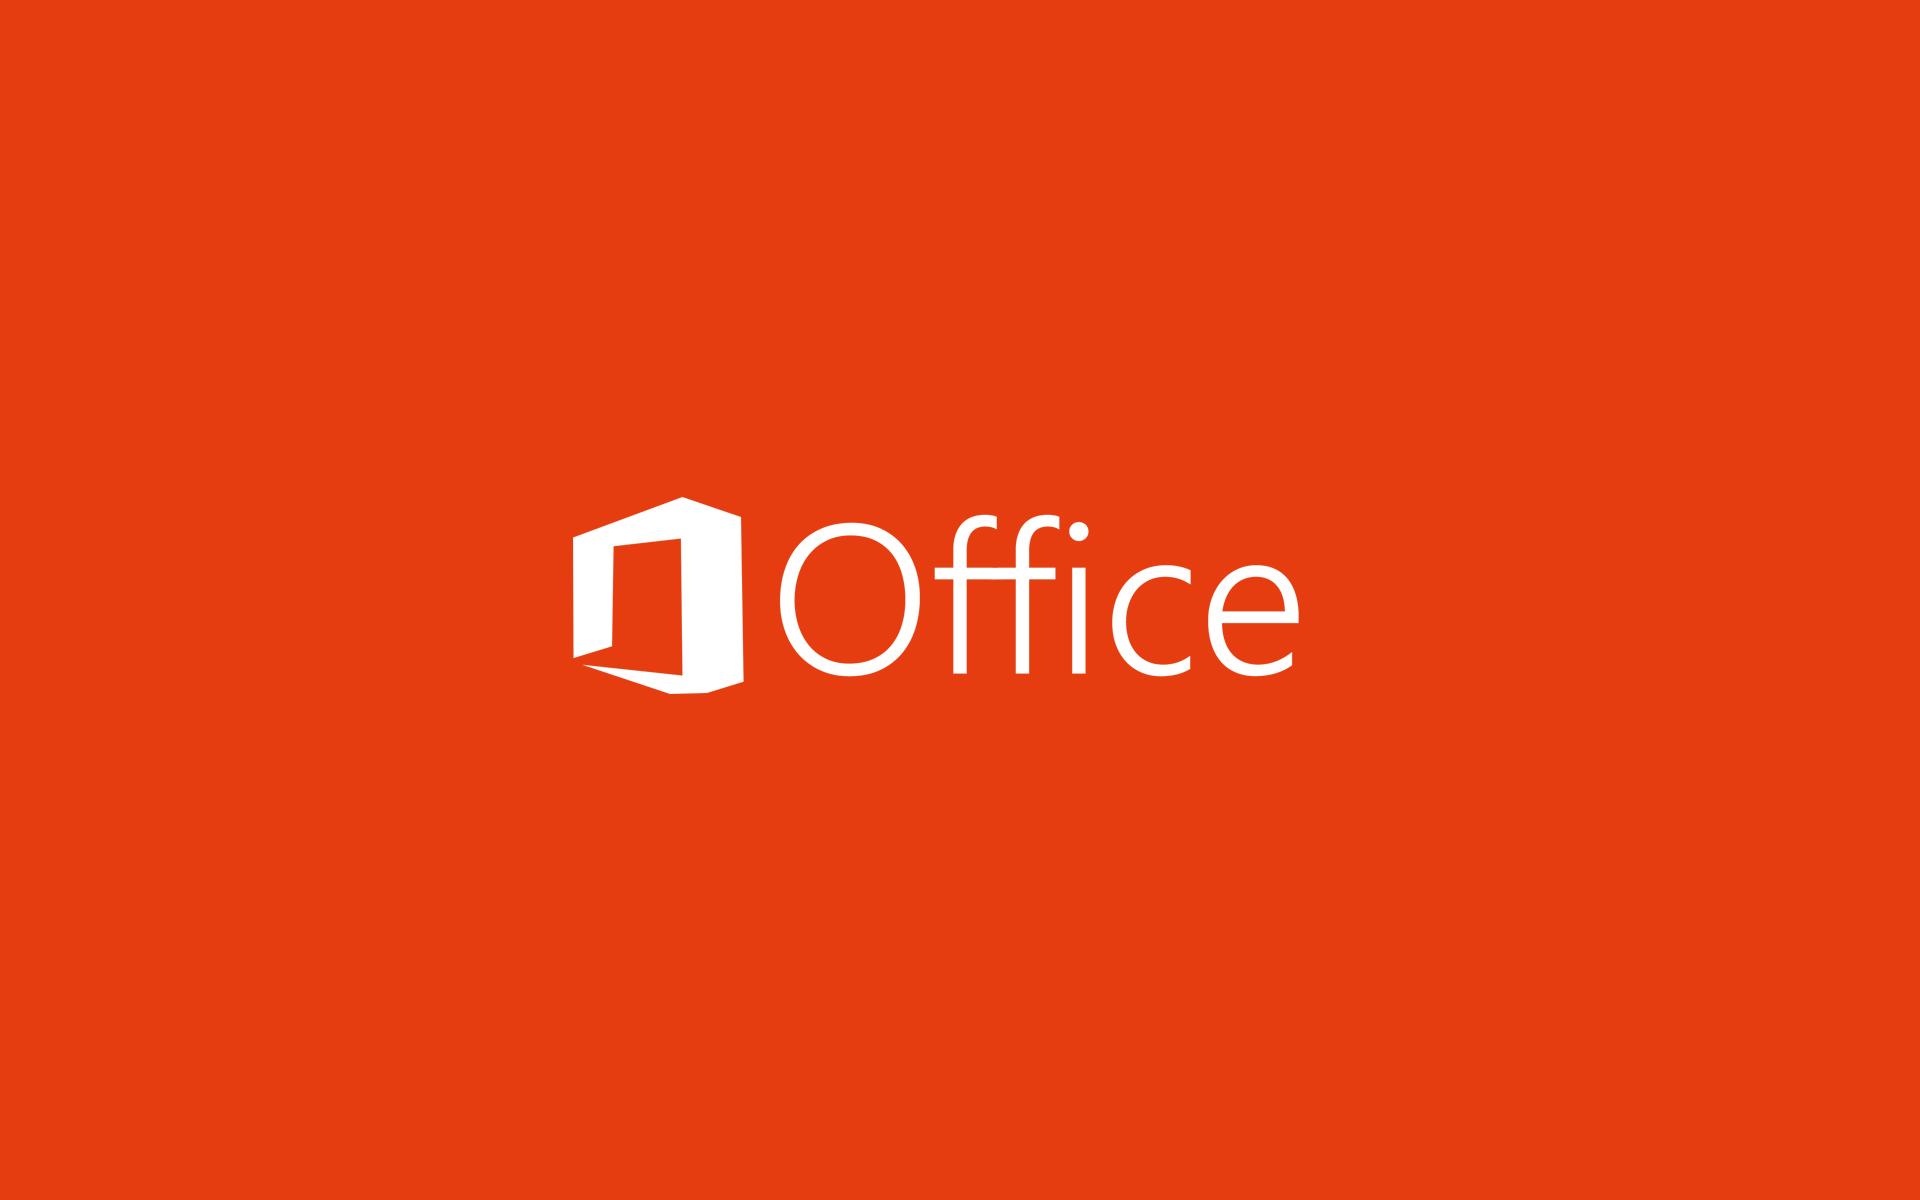 microsoft office wallpaper free download